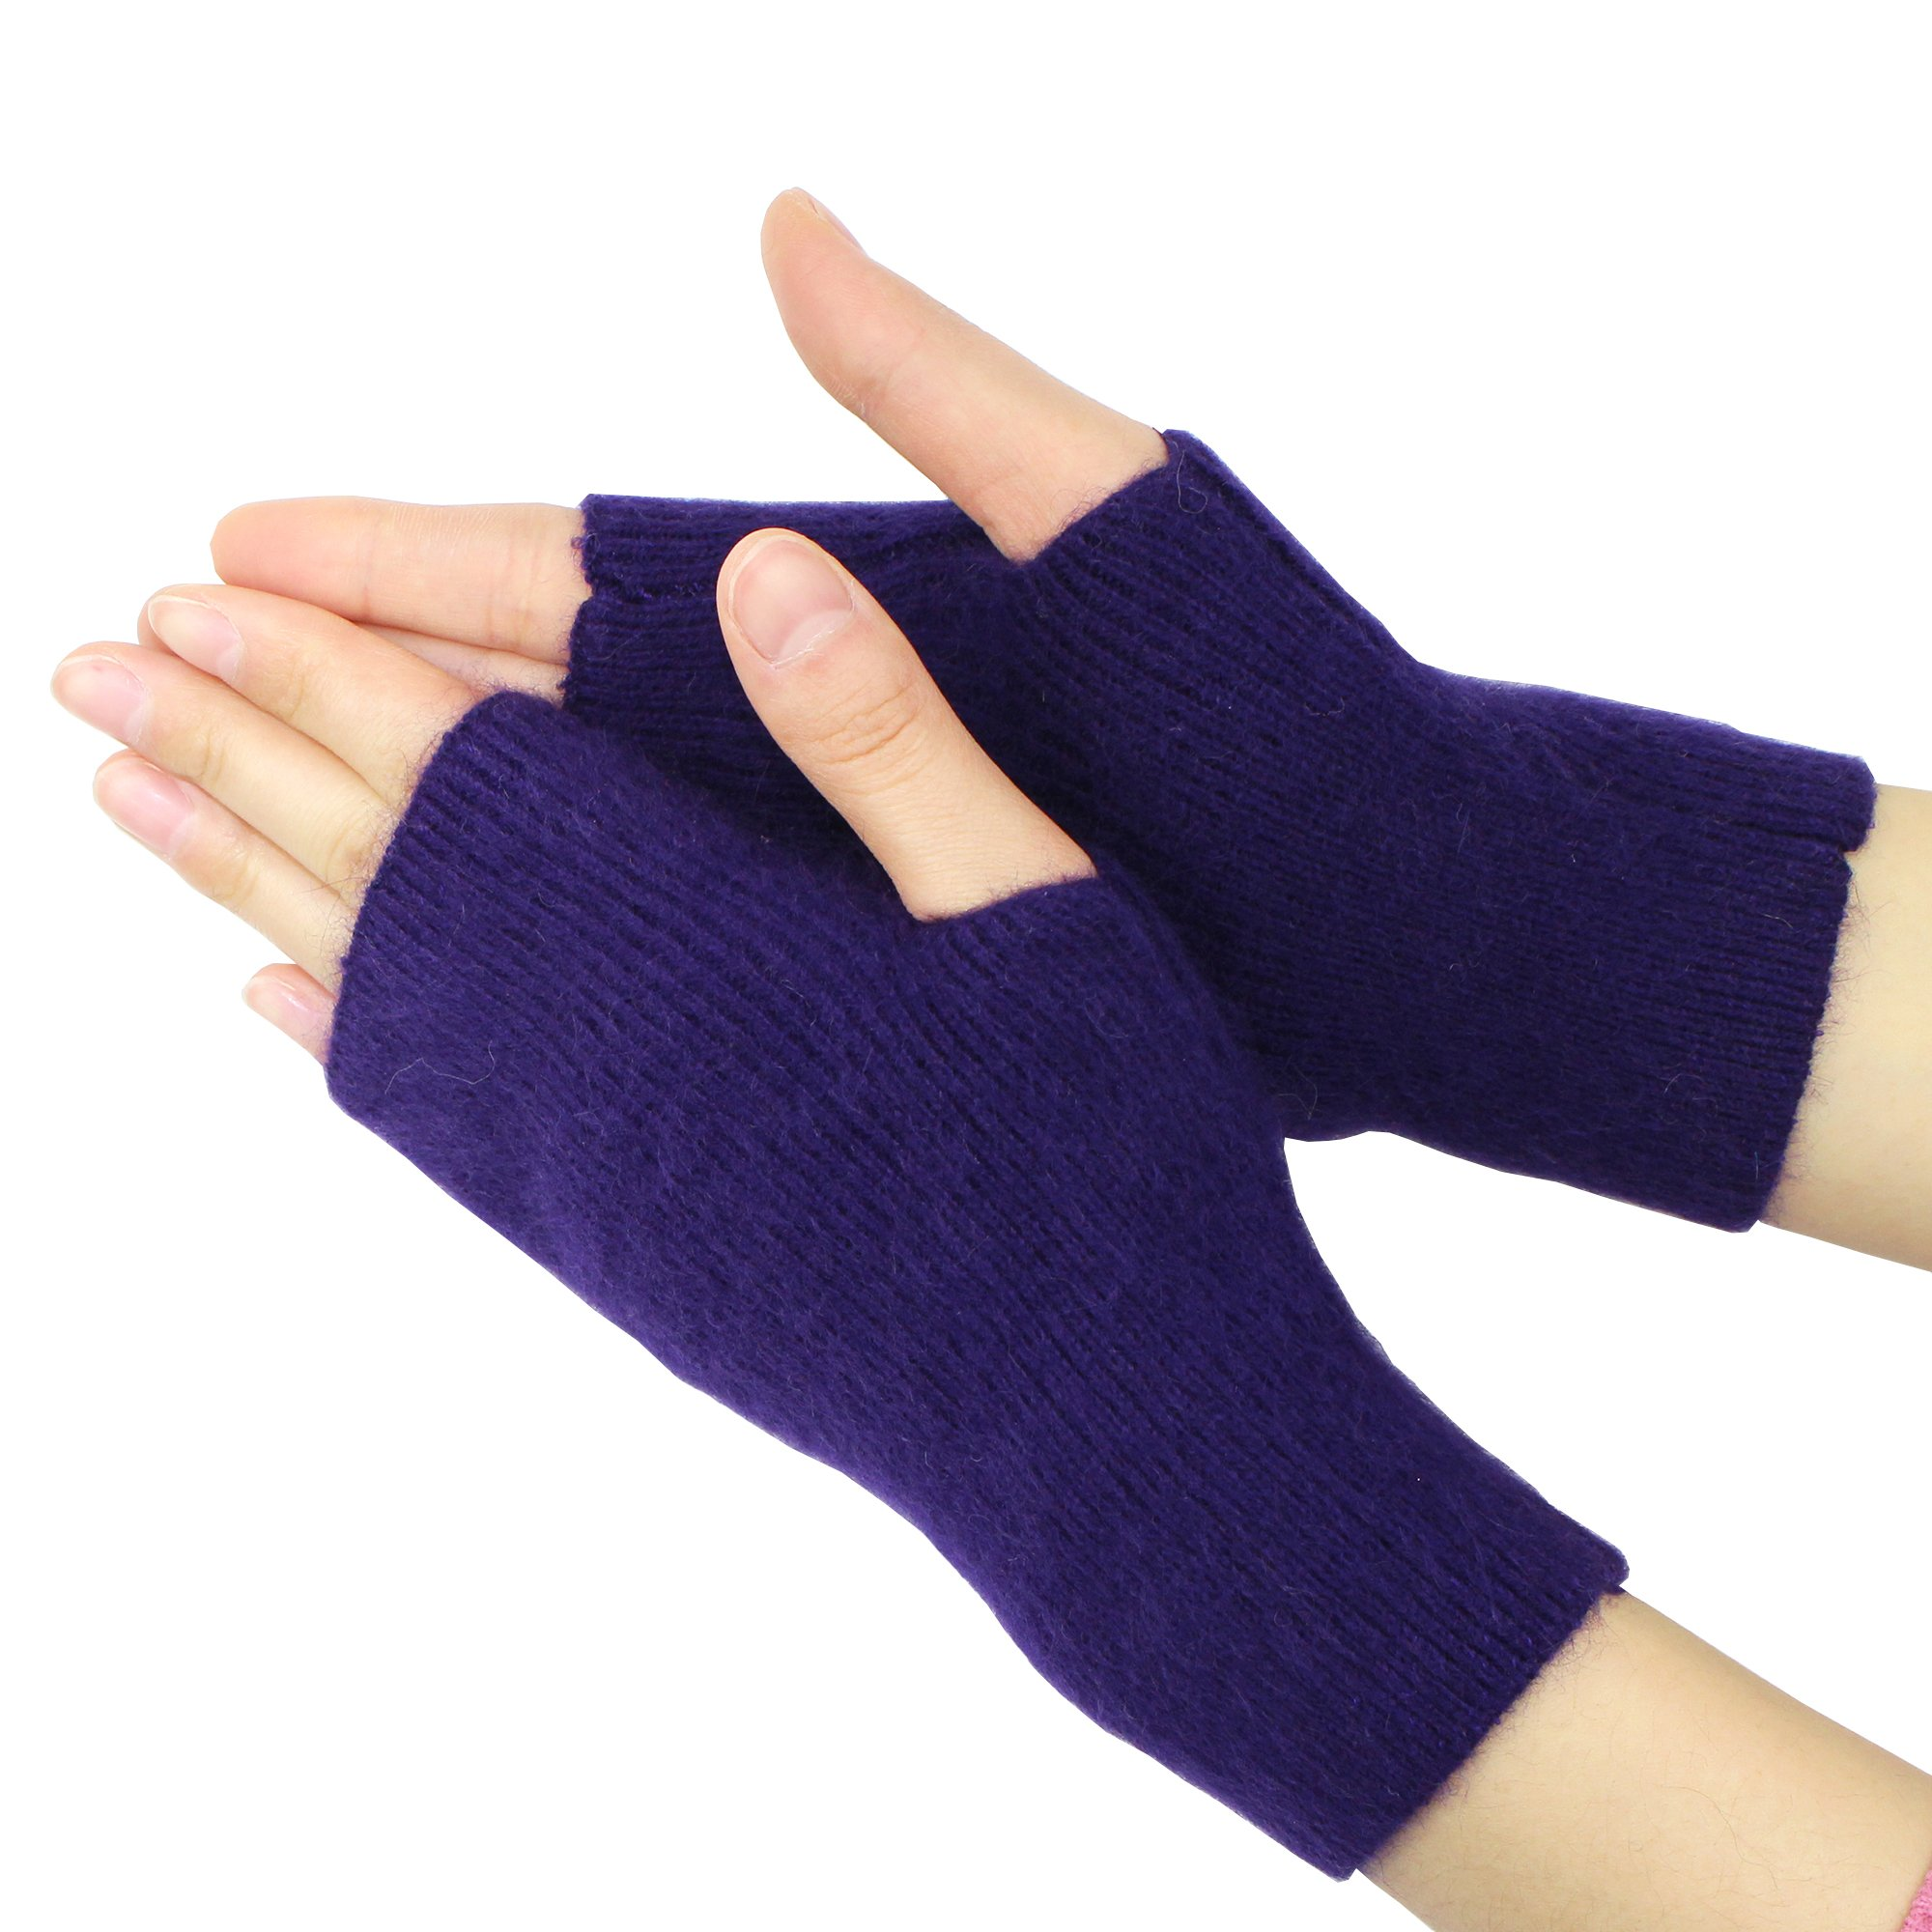 Volyer Women's Winter Mink Cashmere Half Finger Gloves Cute Fingerless Gloves Mitts Christmas Xmas Gift for Girlfriend Wife Lover Mother (Purple)